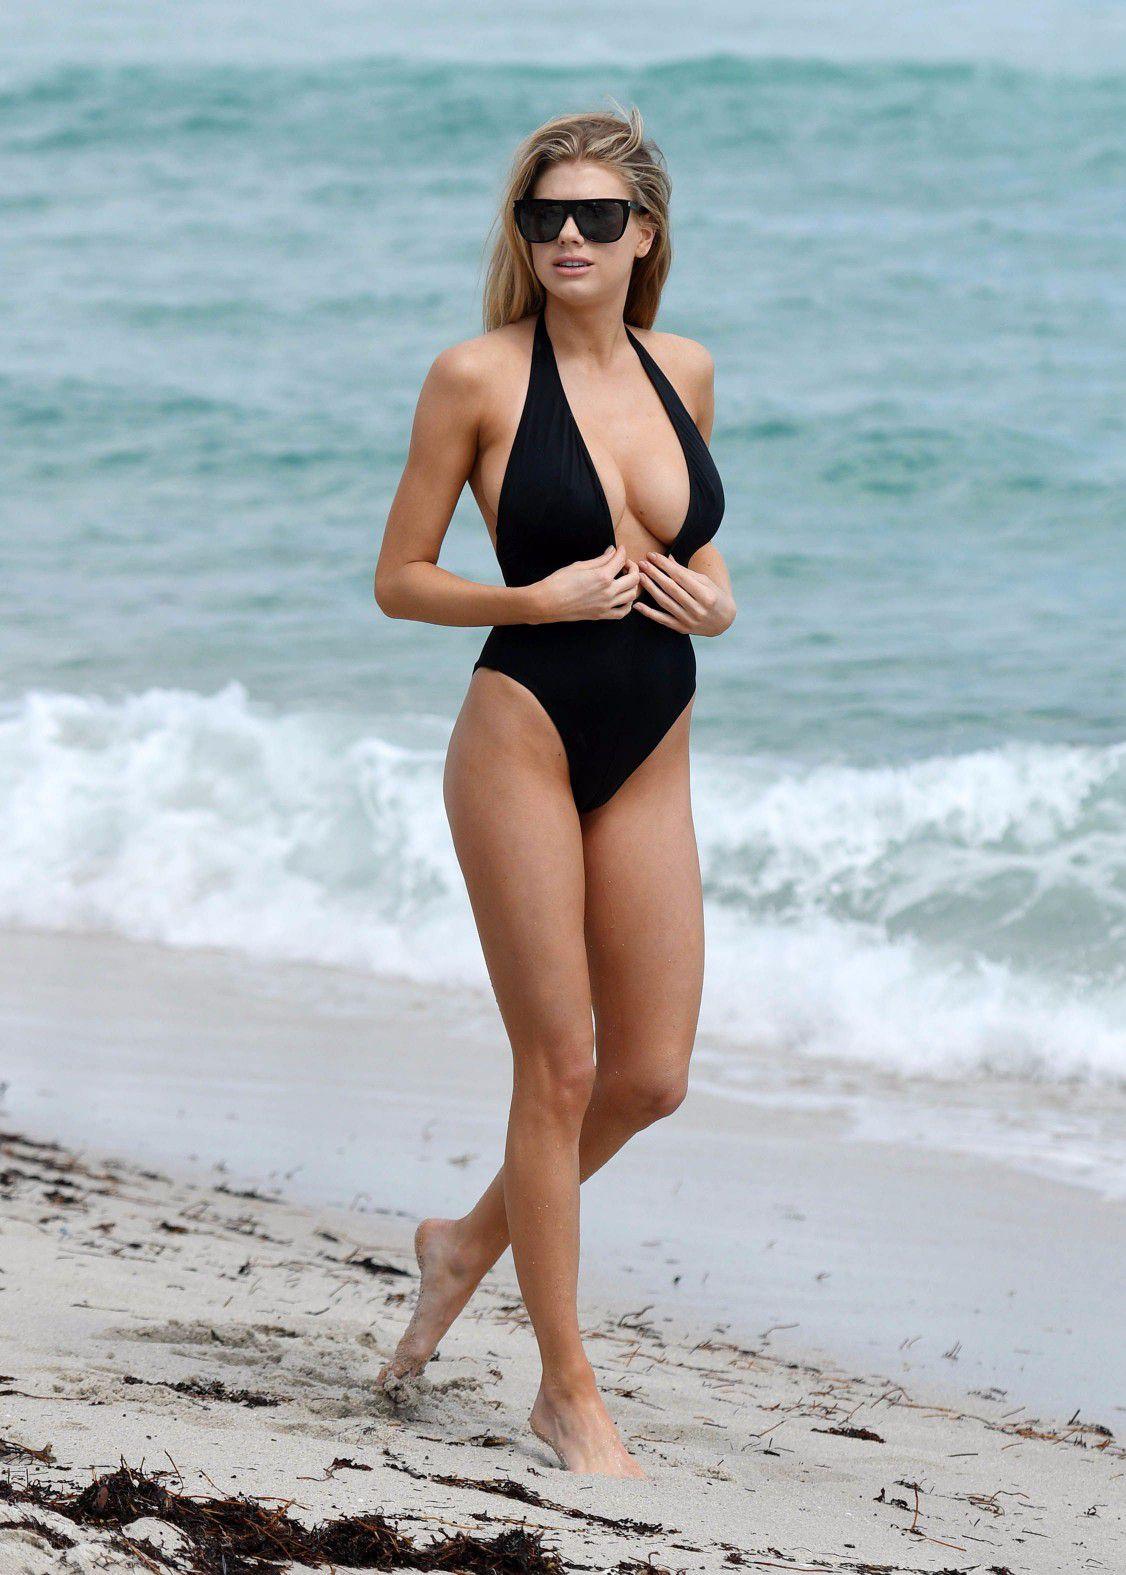 charlotte-mckinney-nipple-slip-at-the-beach-in-miami-17